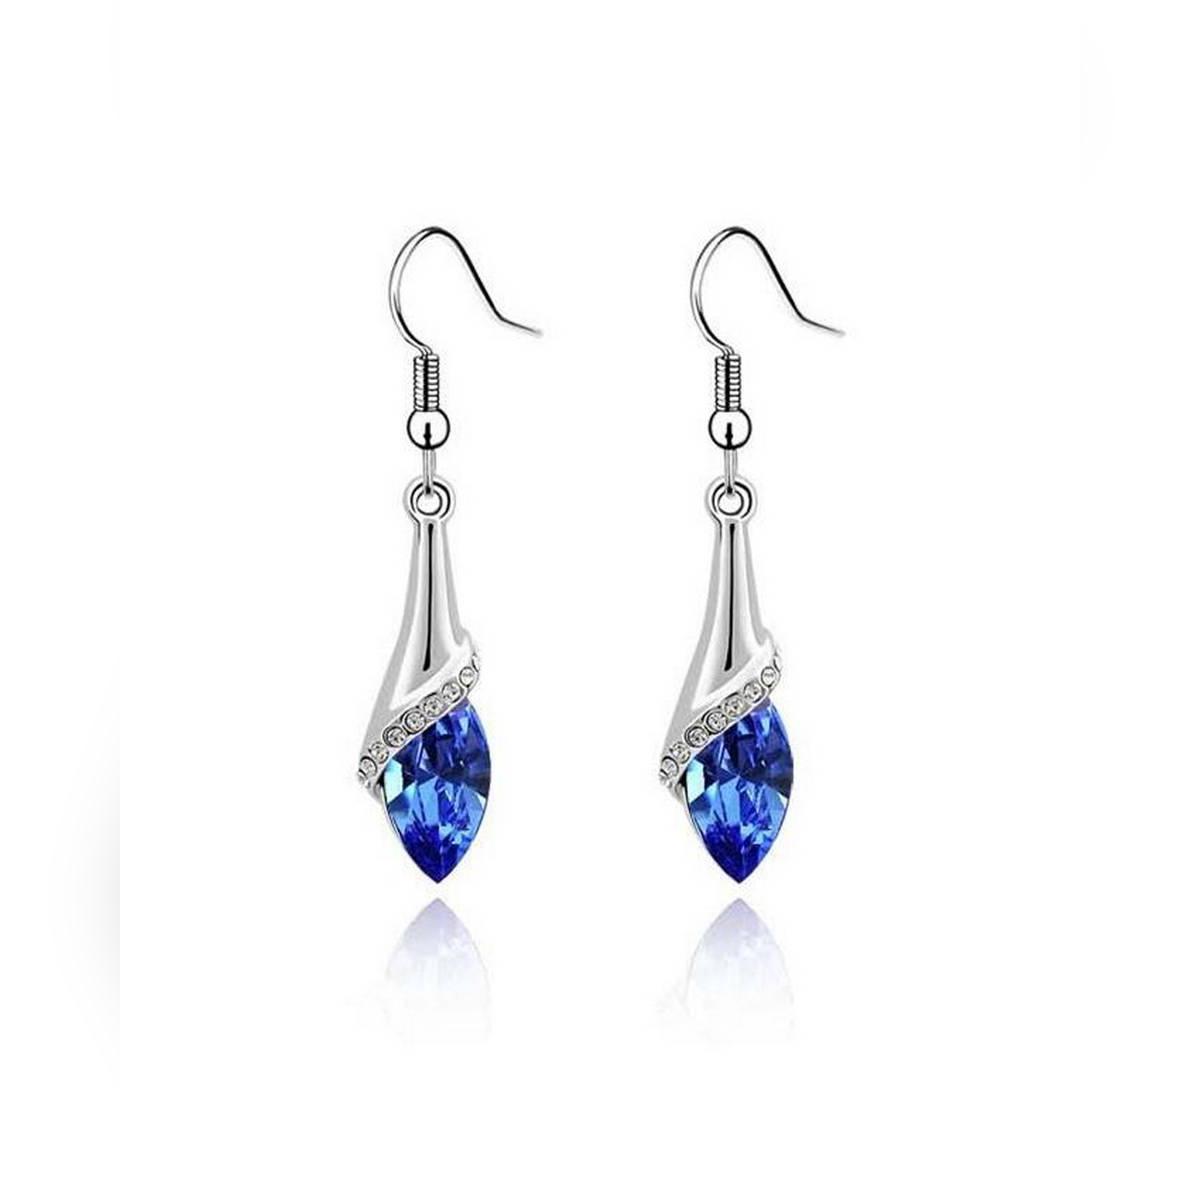 Platinum Plated Crystals Earrings for Women - ER-0062